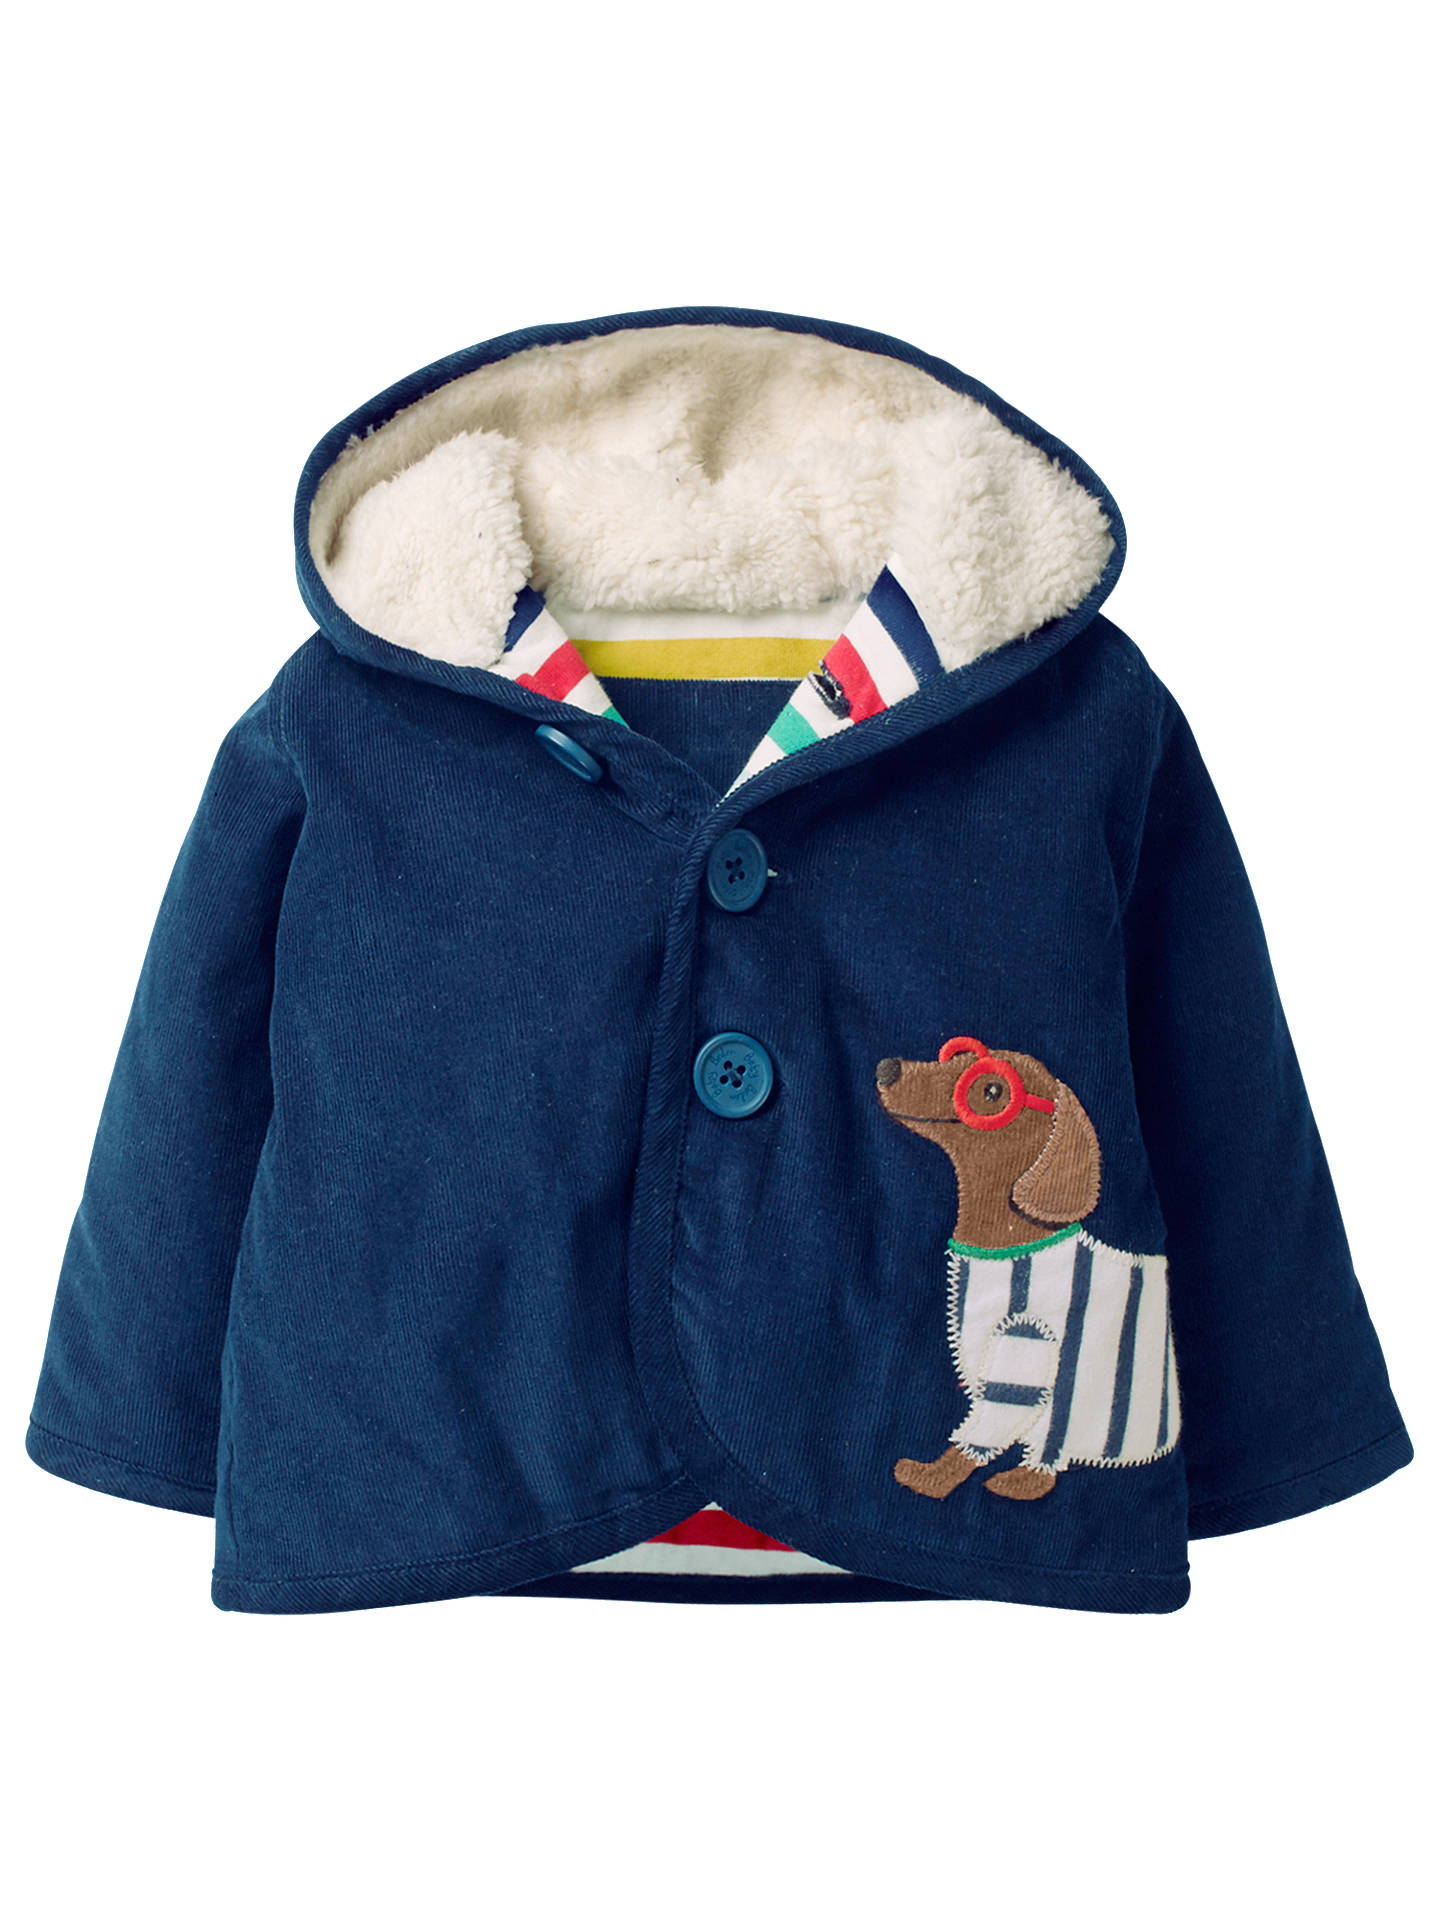 0edbc7ab9 Mini Boden Baby Cord Jacket